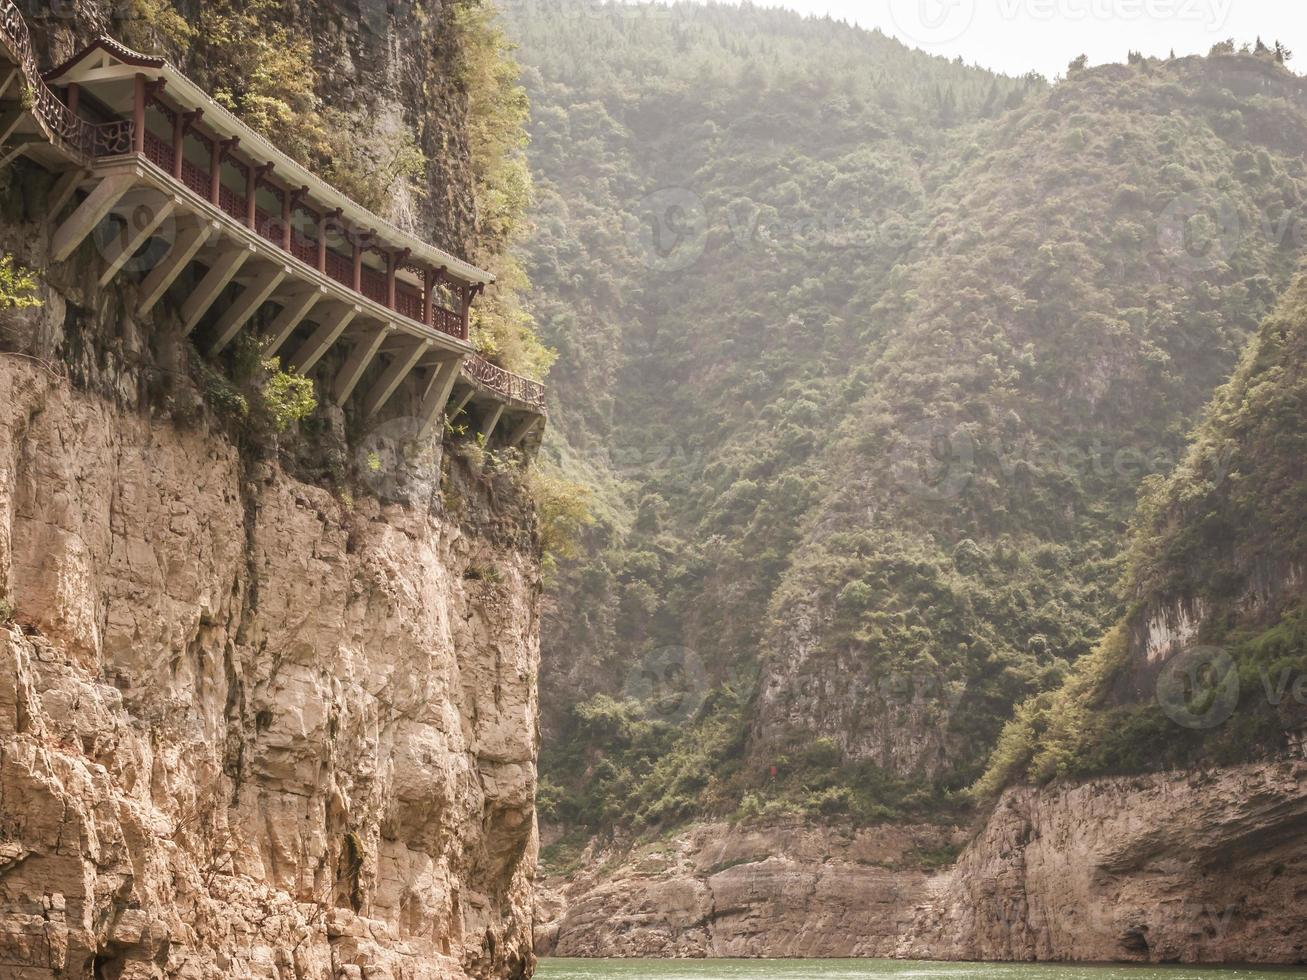 yangzi-floden foto